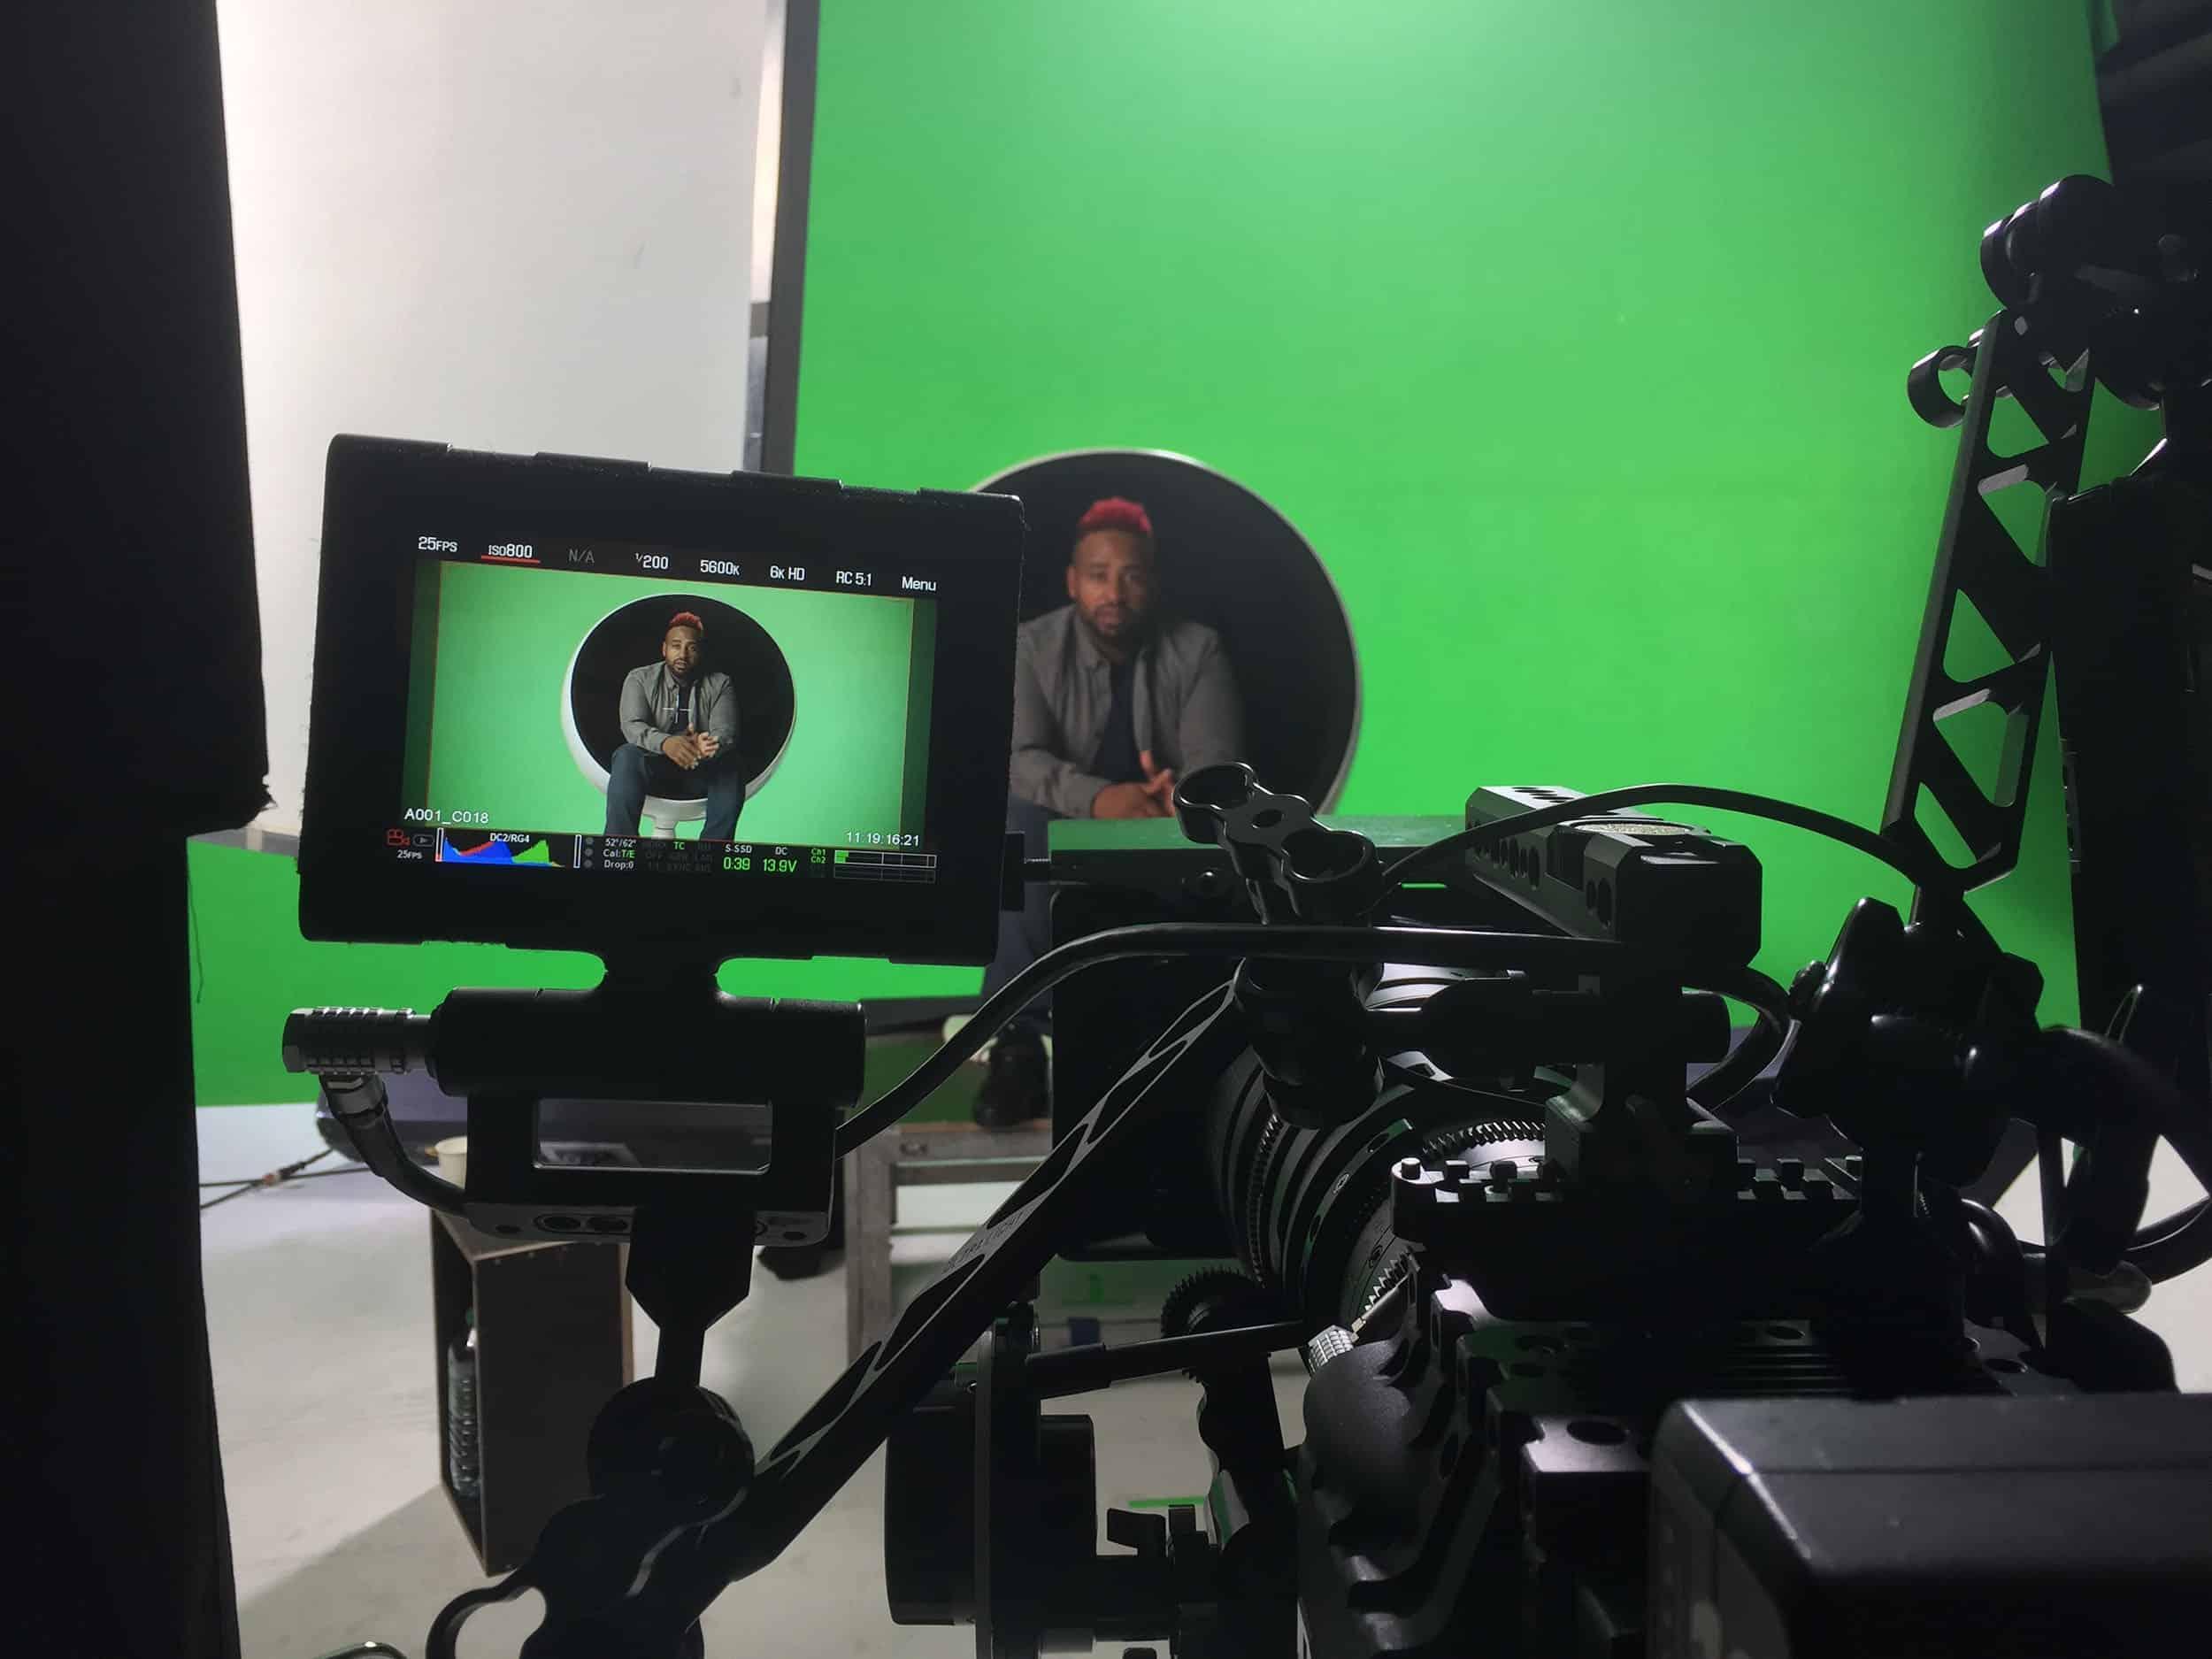 studio-ignatov-rolandversicherung-adokojo-tvcommercial-03